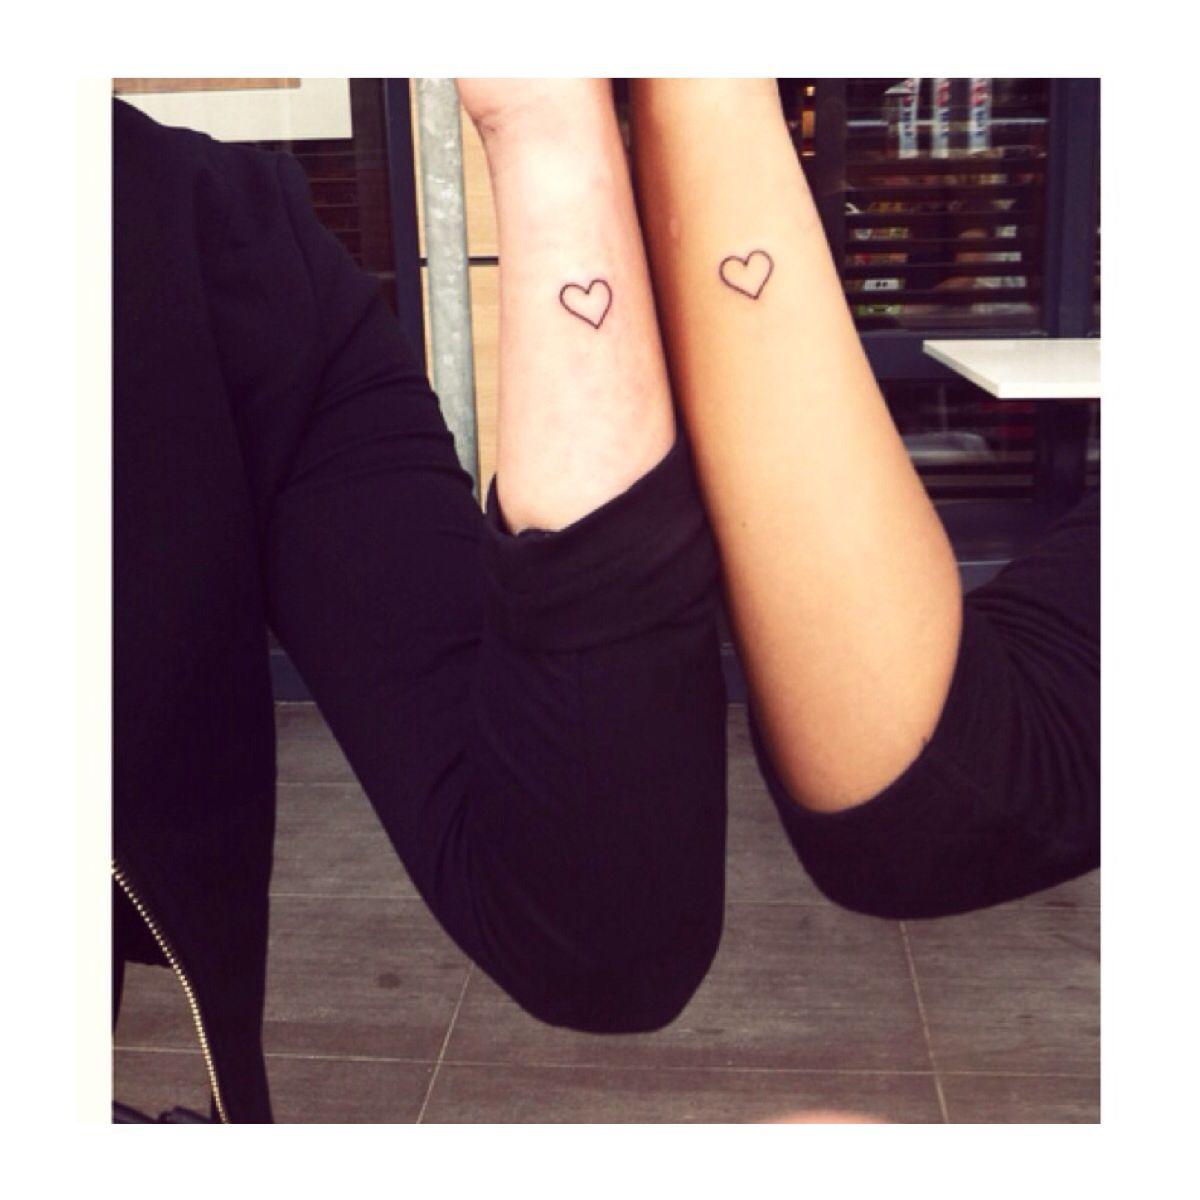 Zussen Liefde Tattoo 3 Things I Want Couple Tattoos